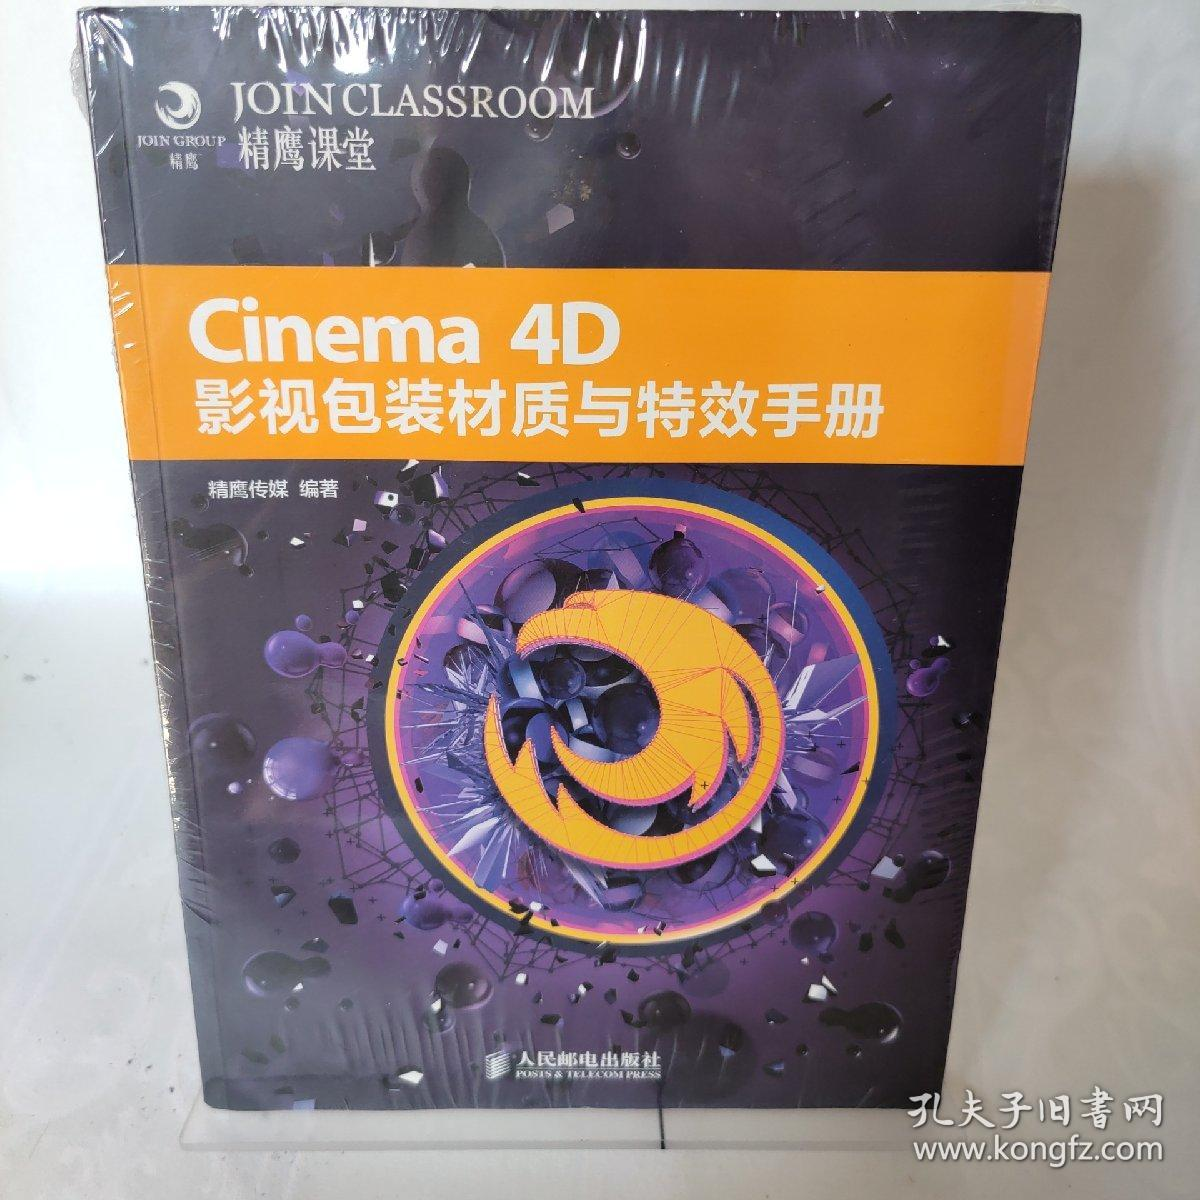 Cinema 4D影视包装材质与特效手册